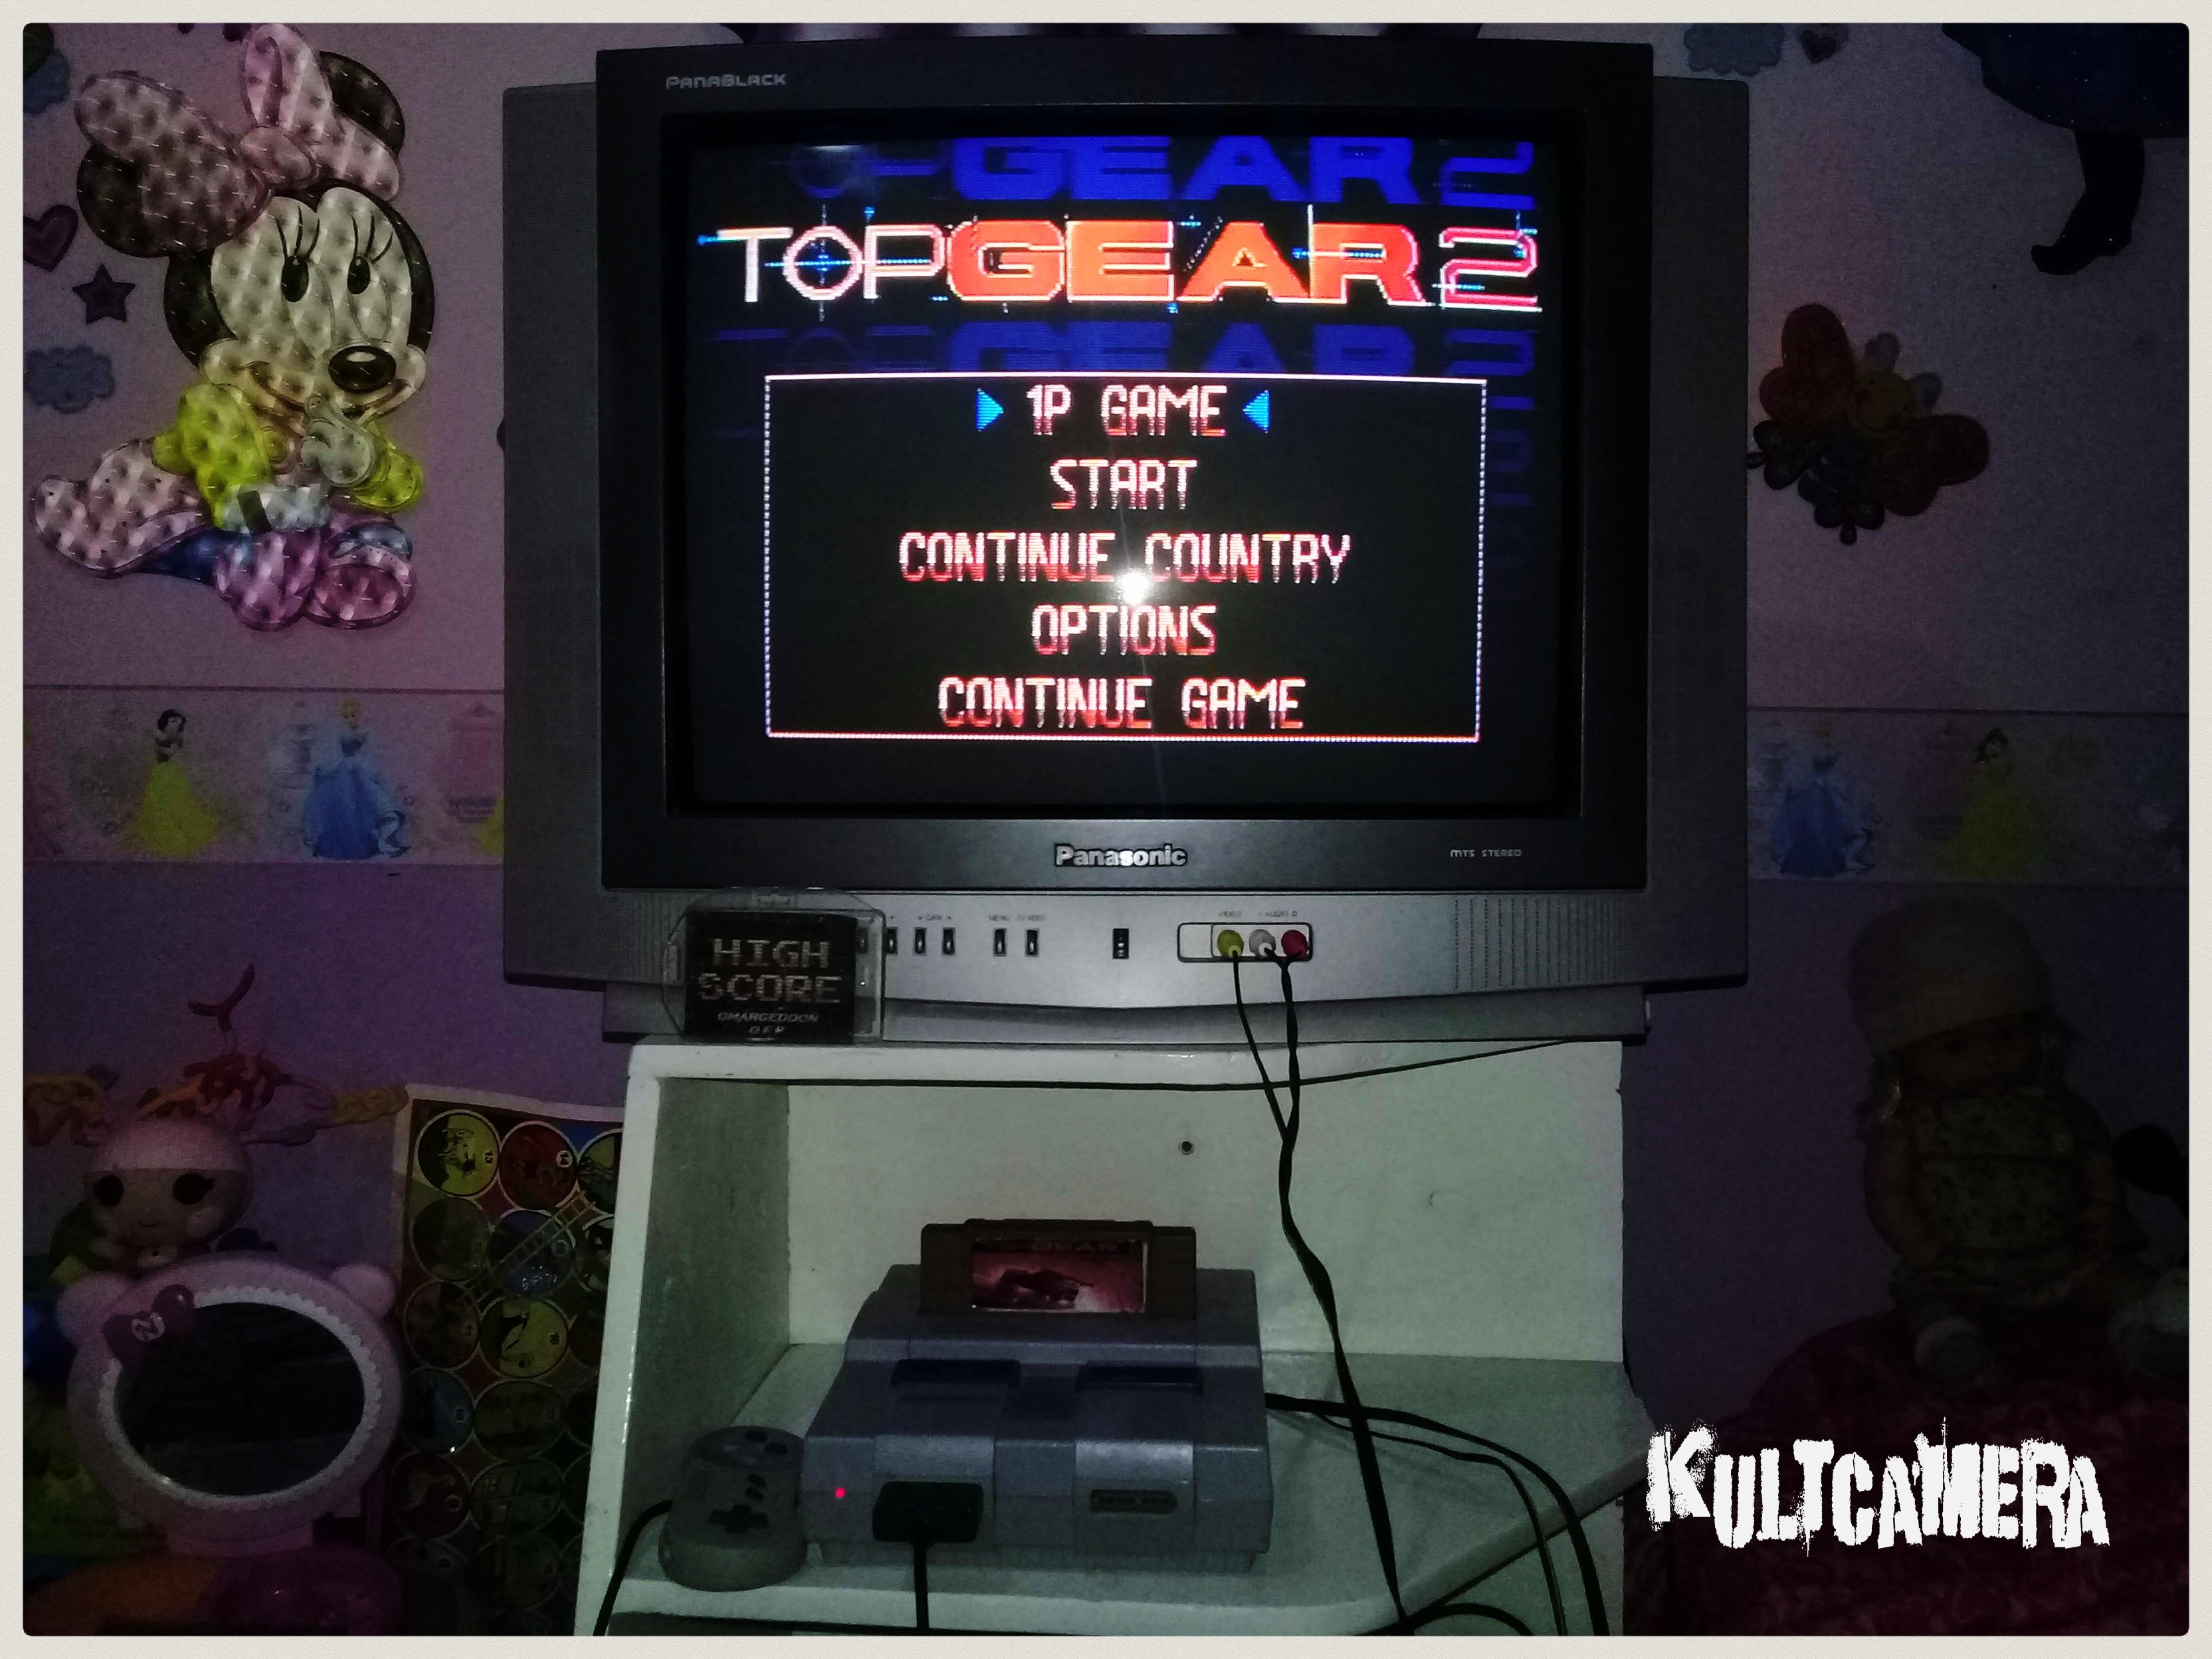 omargeddon: Top Gear 2: Australasia: Ayers Rock [Amateur / Nitro Allowed] (SNES/Super Famicom) 0:02:42.16 points on 2019-07-14 12:37:47